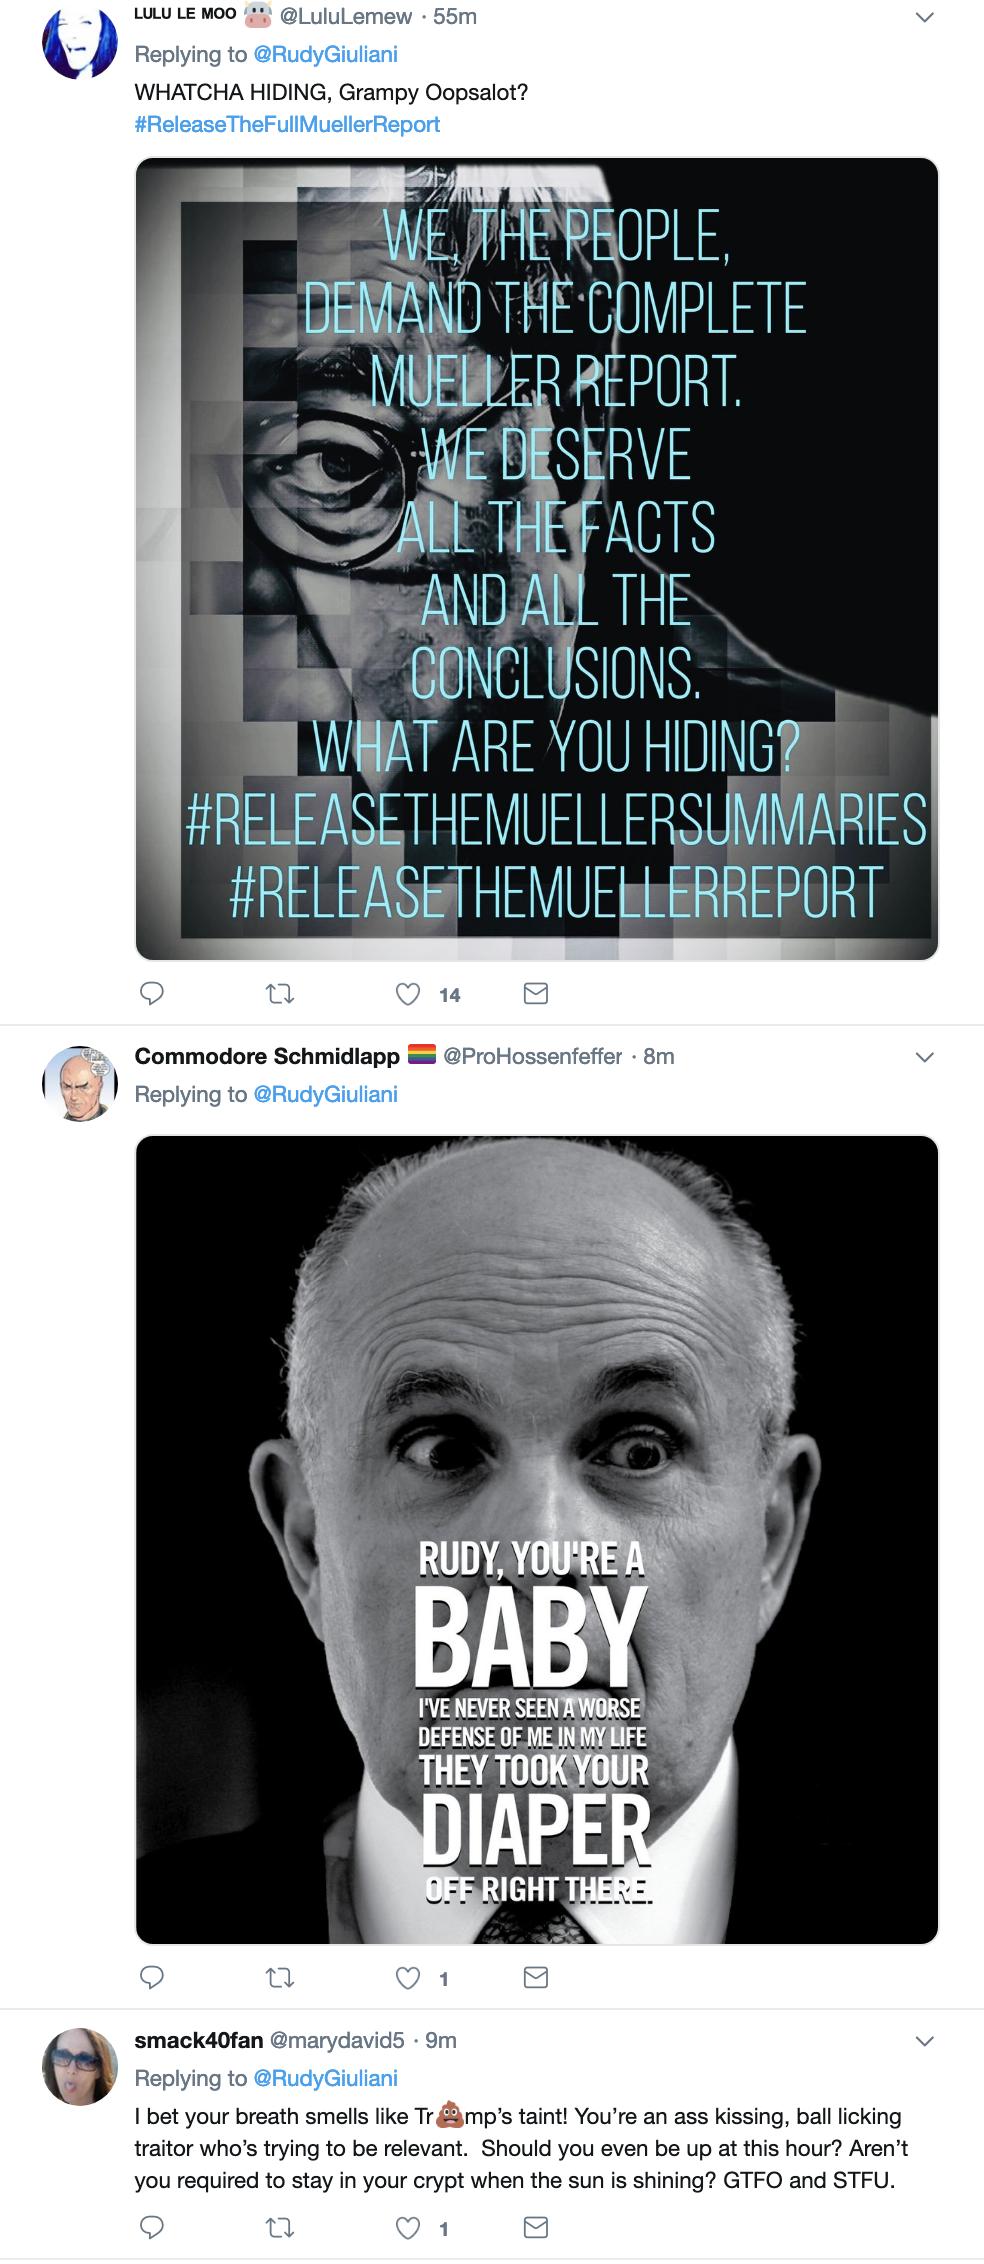 Screen-Shot-2019-04-10-at-2.28.55-PM Giuliani Creates PR Nightmare For Trump During Bizarre Twitter Meltdown Corruption Crime Donald Trump Politics Top Stories